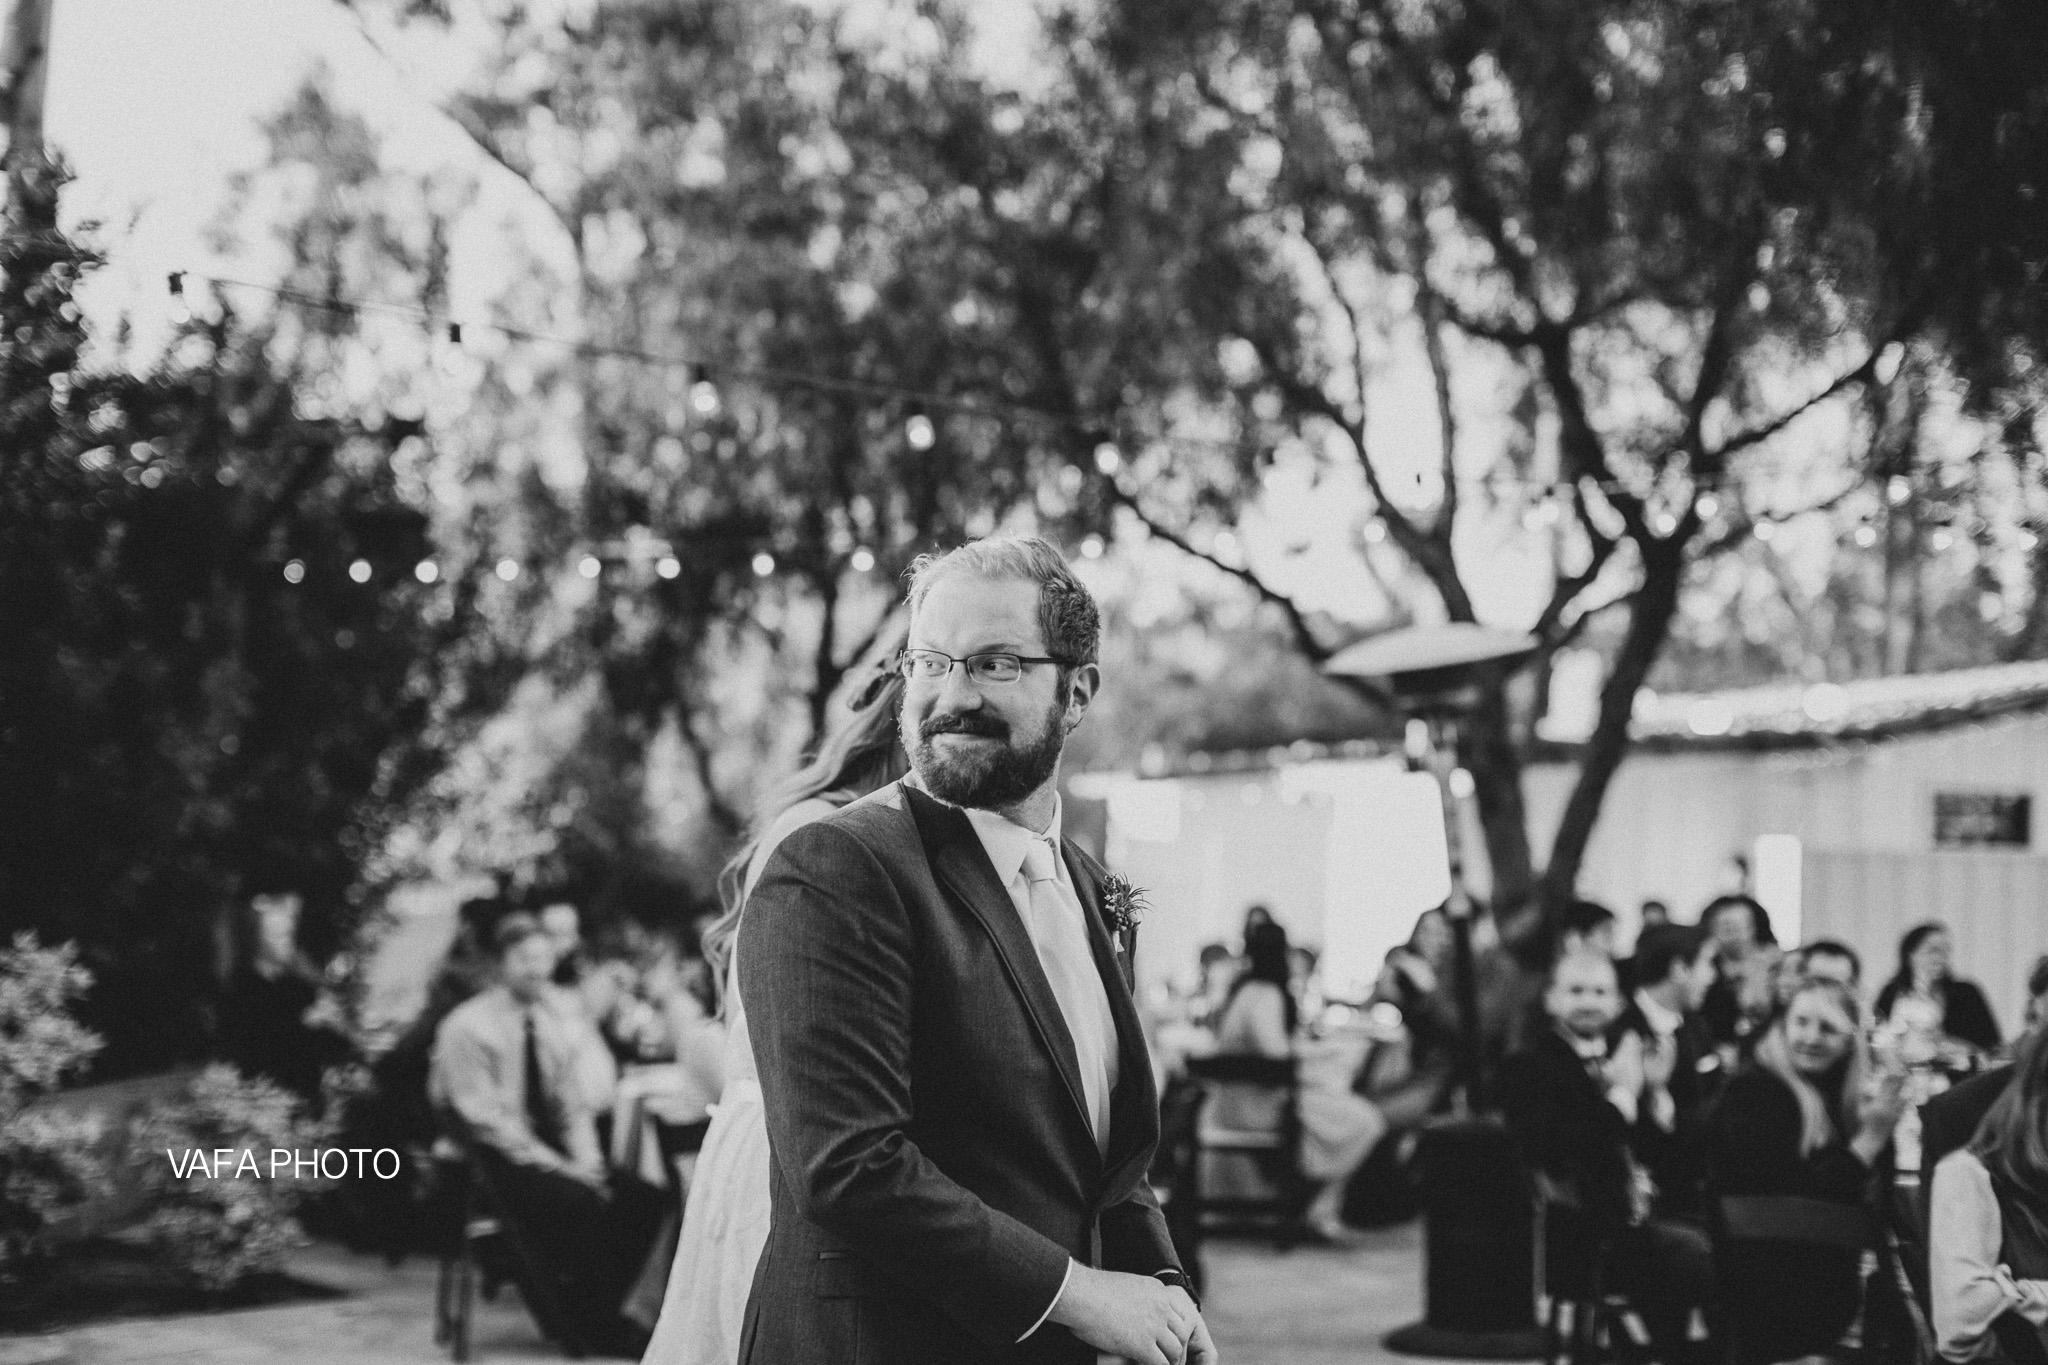 Leo-Carrillo-Ranch-Wedding-Lauren-Mike-Vafa-Photo-950.jpg